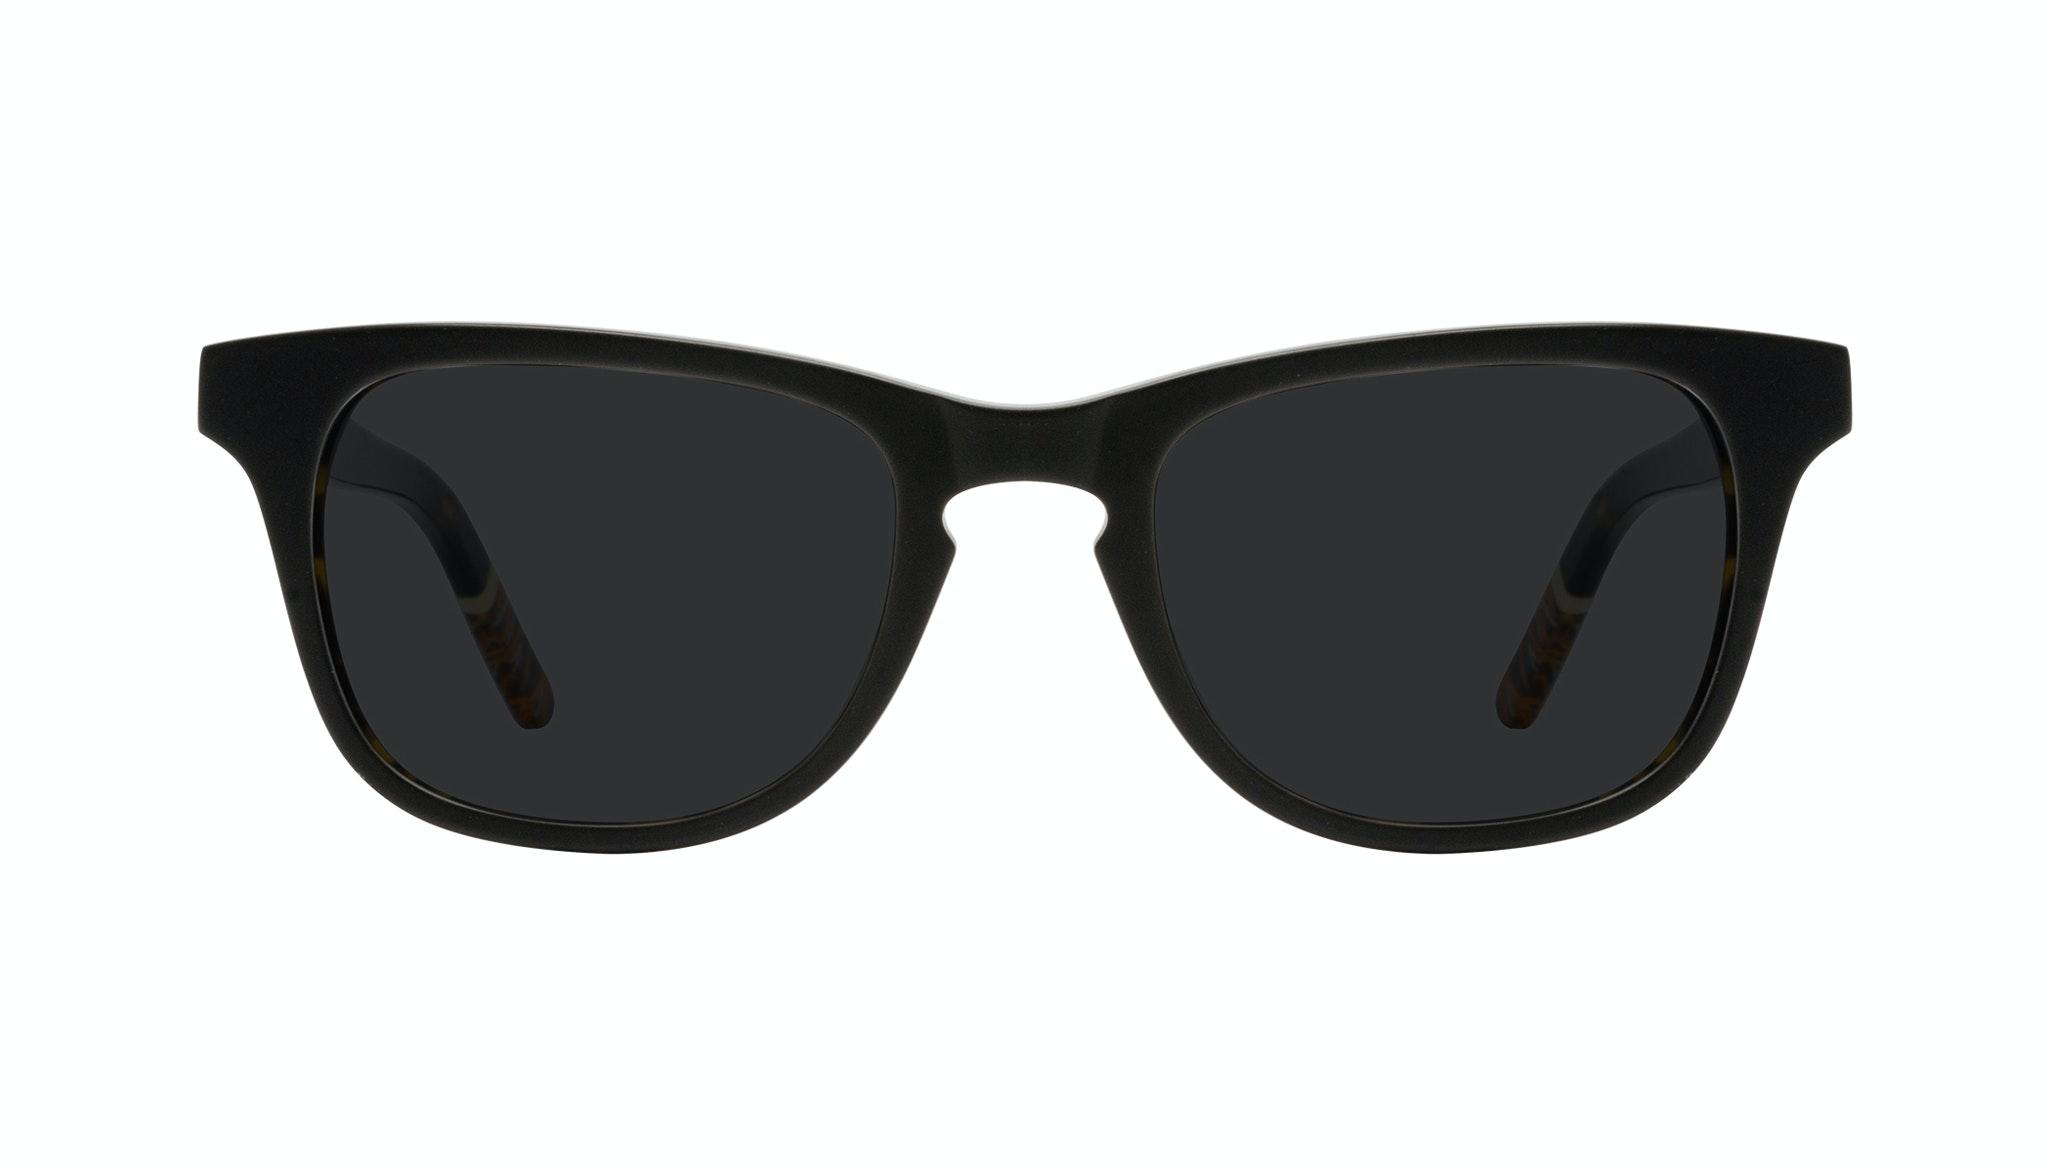 Affordable Fashion Glasses Rectangle Sunglasses Men Trust Black Tort Front